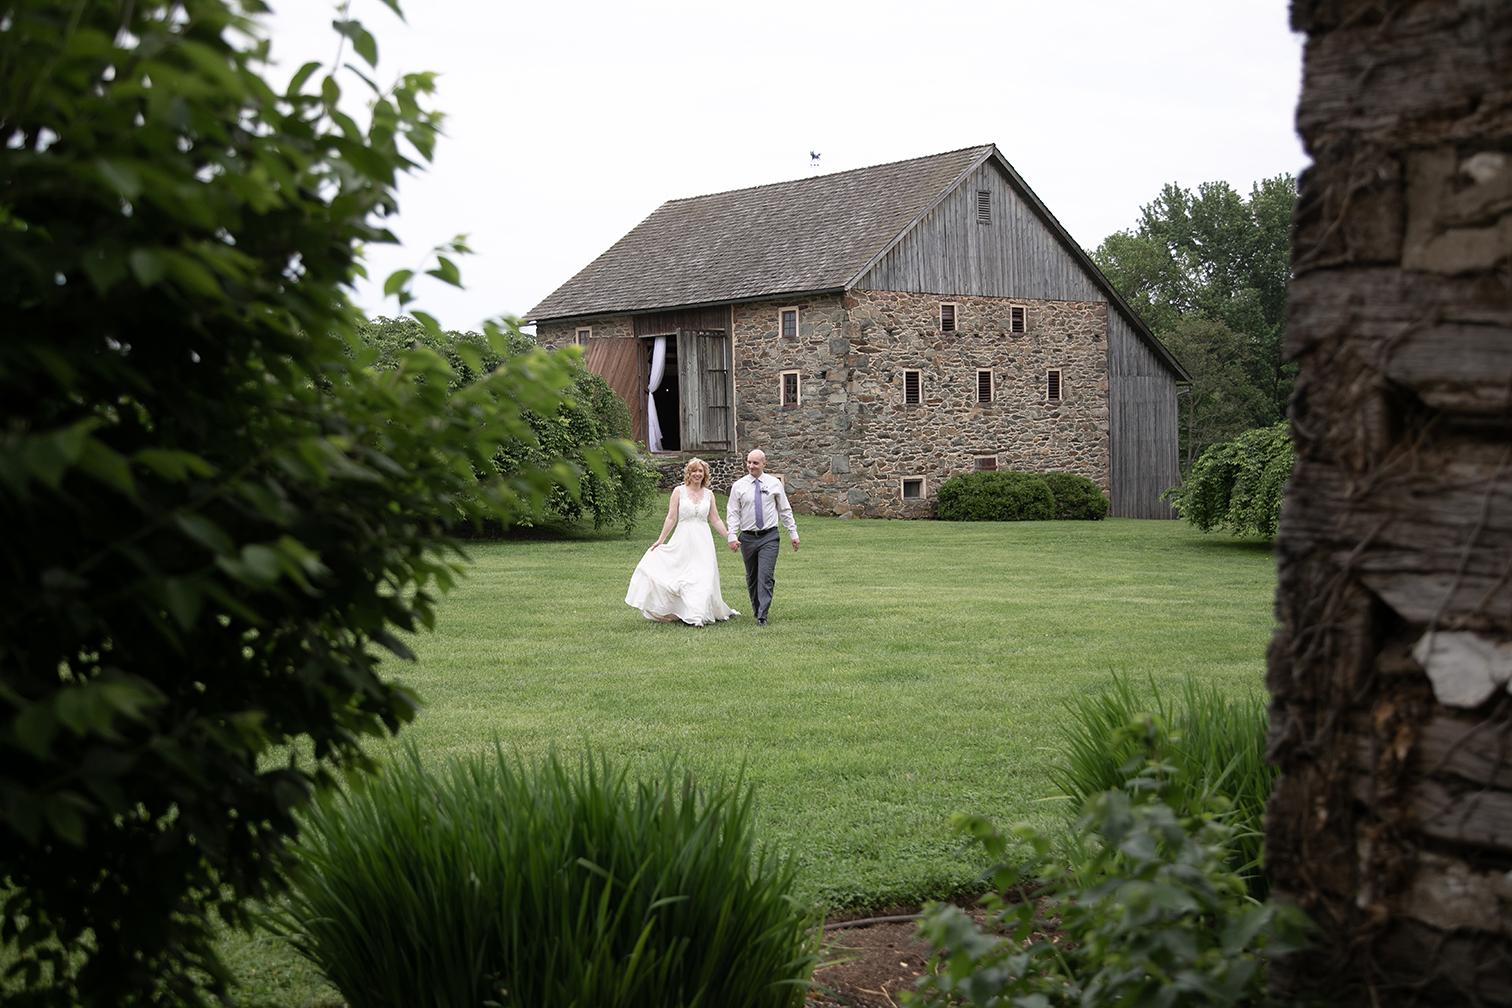 couple walking by barn